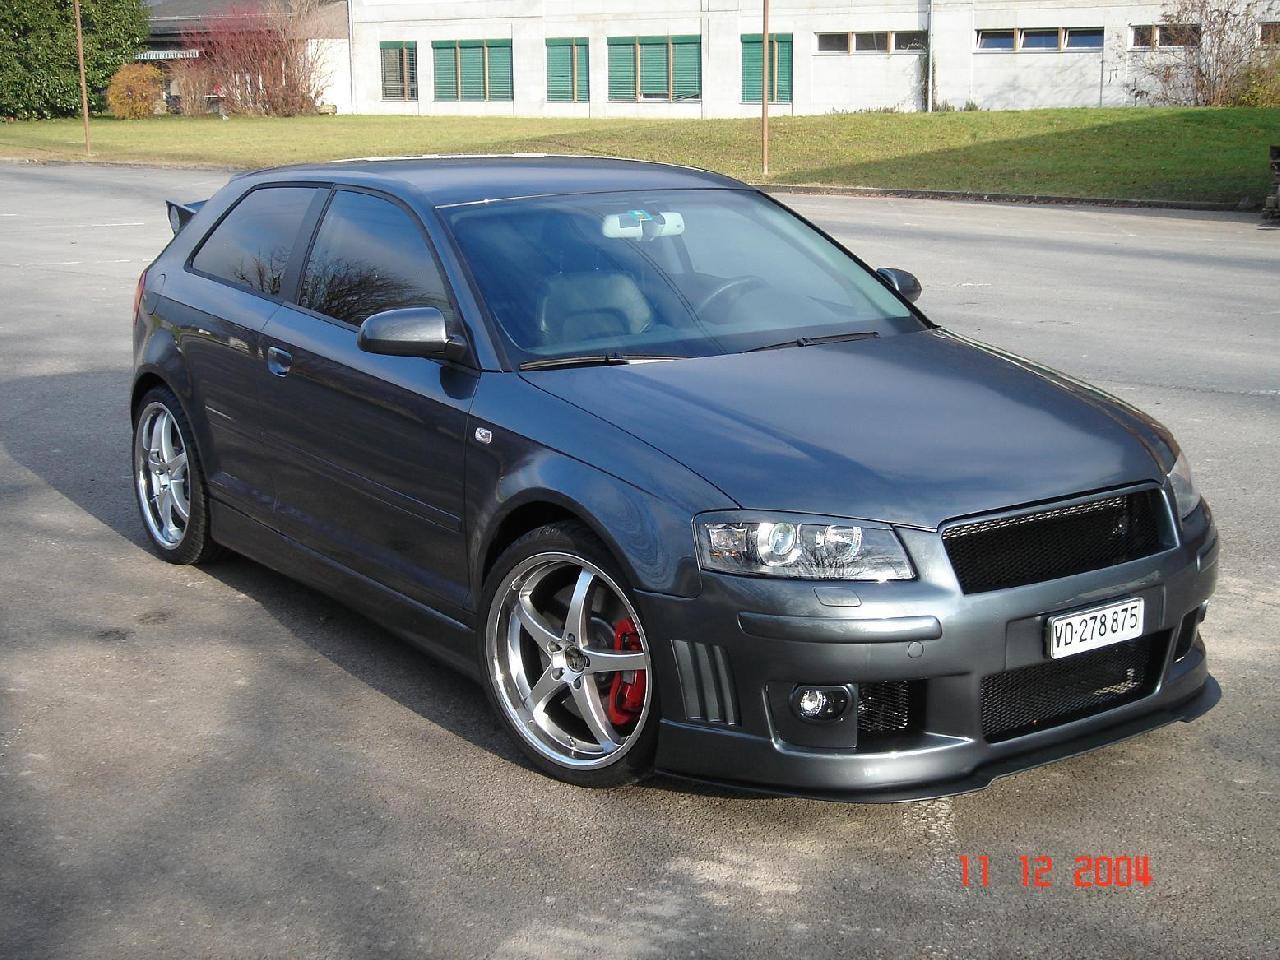 Modified-Audi-S3-8P-2 Audi S3